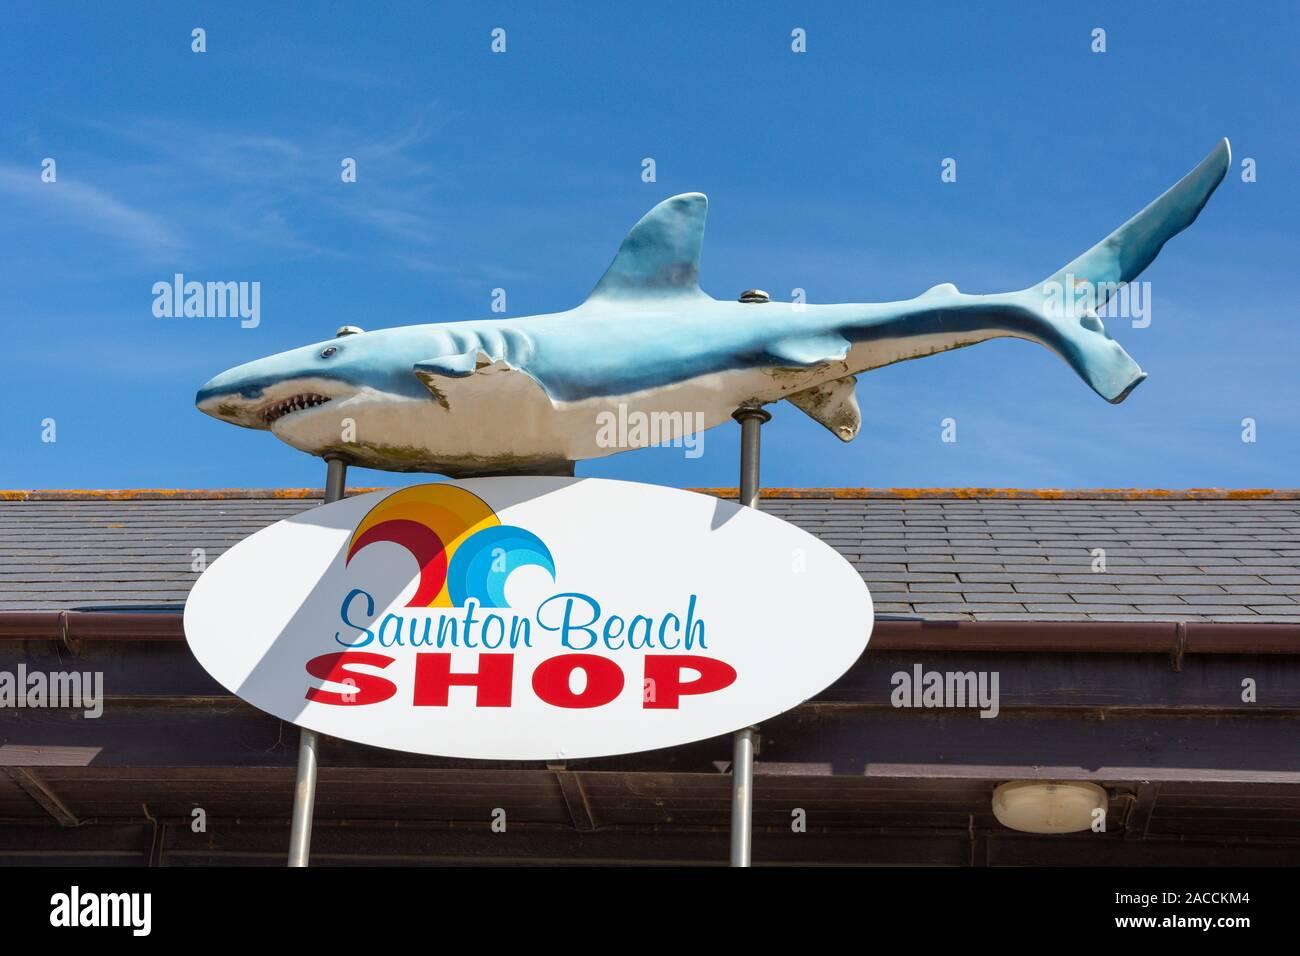 Beach shop entrance sign on Saunton Sands Beach promenade, Saunton, Devon, England, United Kingdom Stock Photo